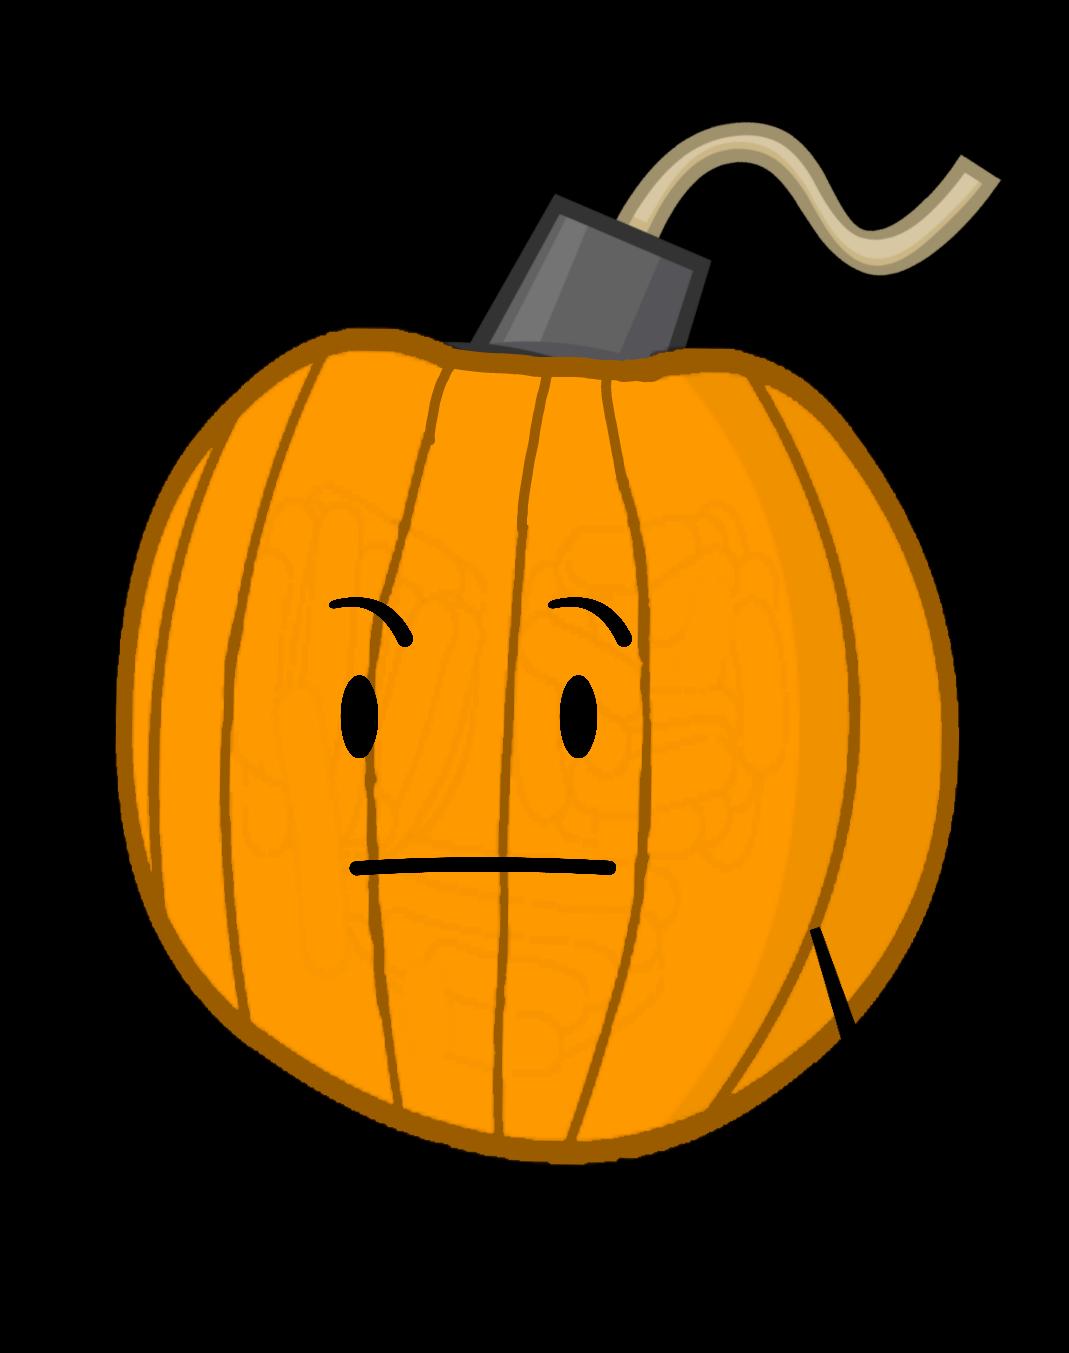 BFDI Characters as Halloween Characters | Bfdi | Table lamp